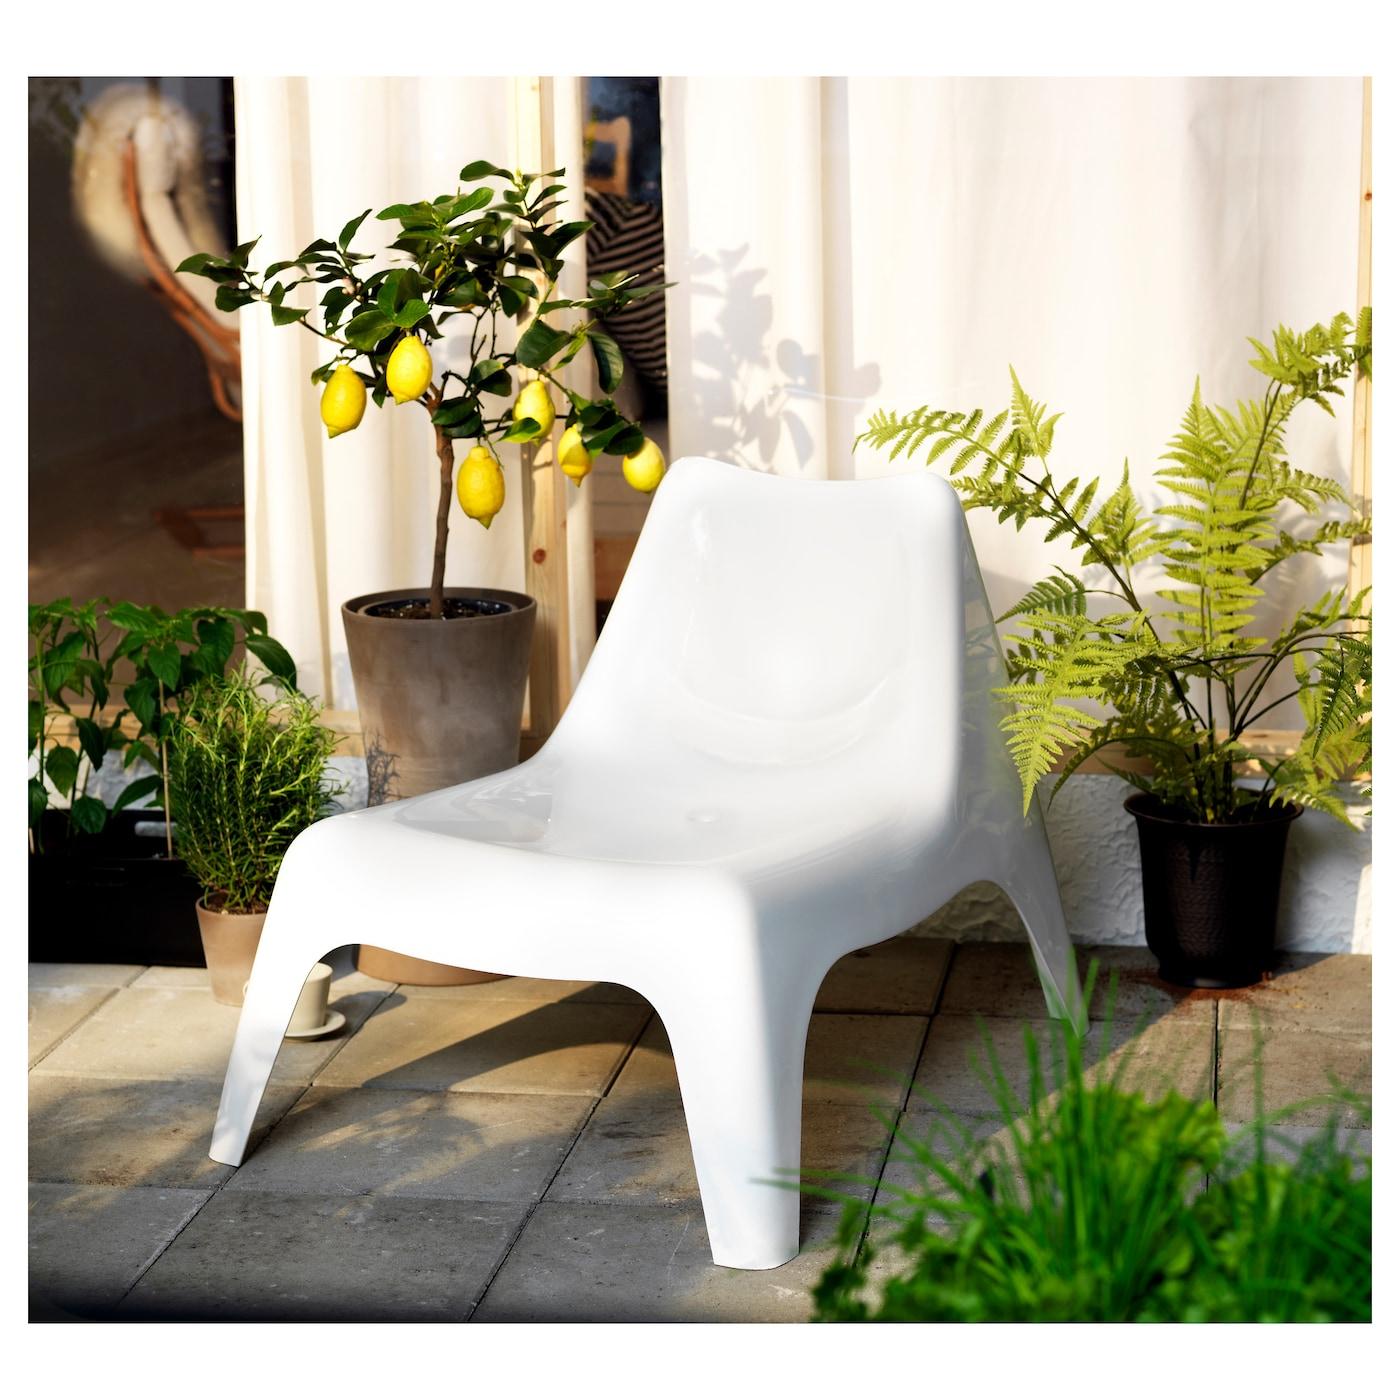 Ikea ps v g fauteuil ext rieur blanc ikea for Fauteuil jardin ikea